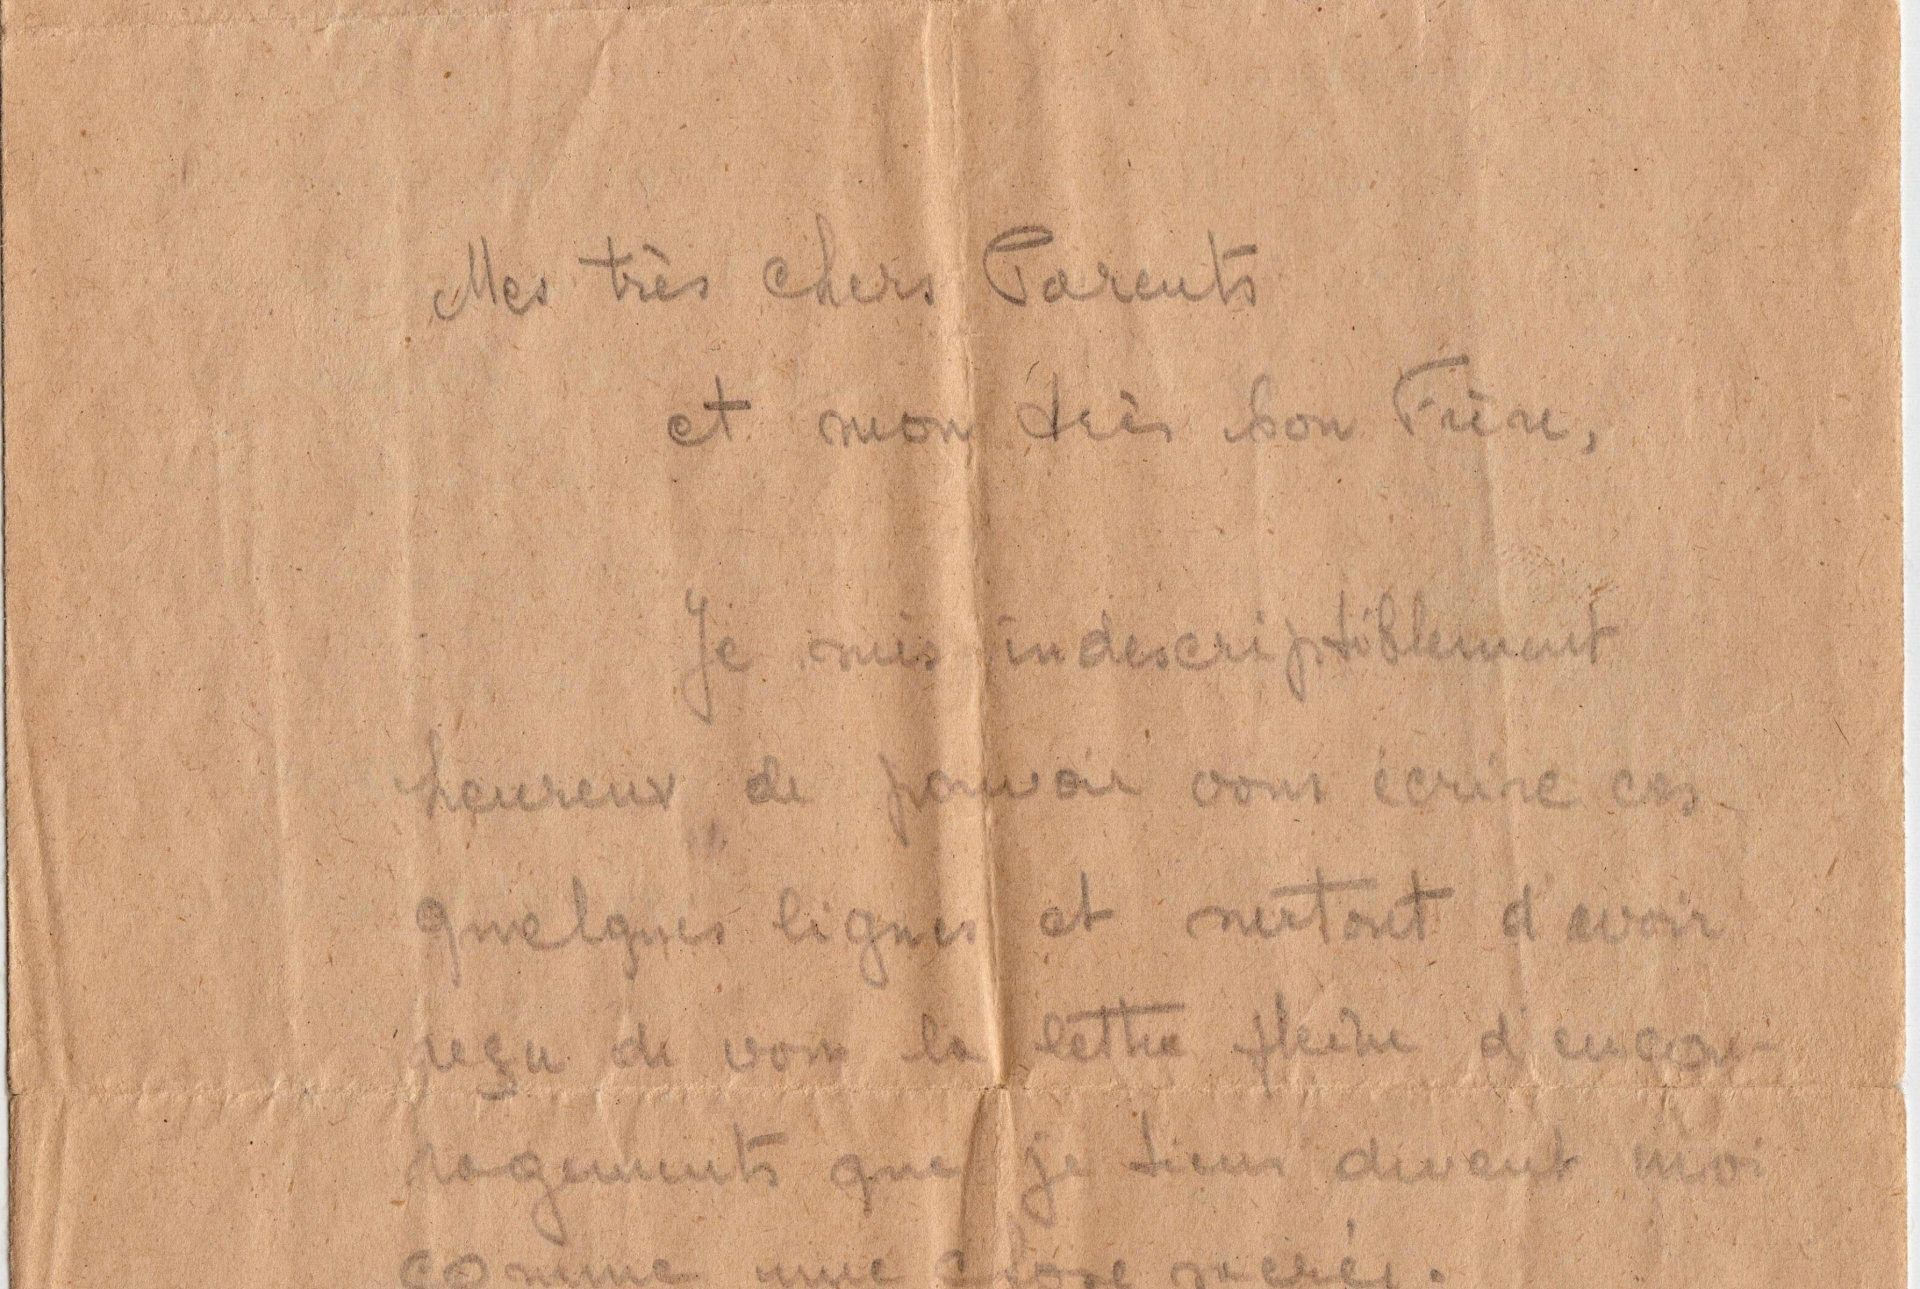 belvirmus_malfait_brief venuit Buchenwald 1 van 3